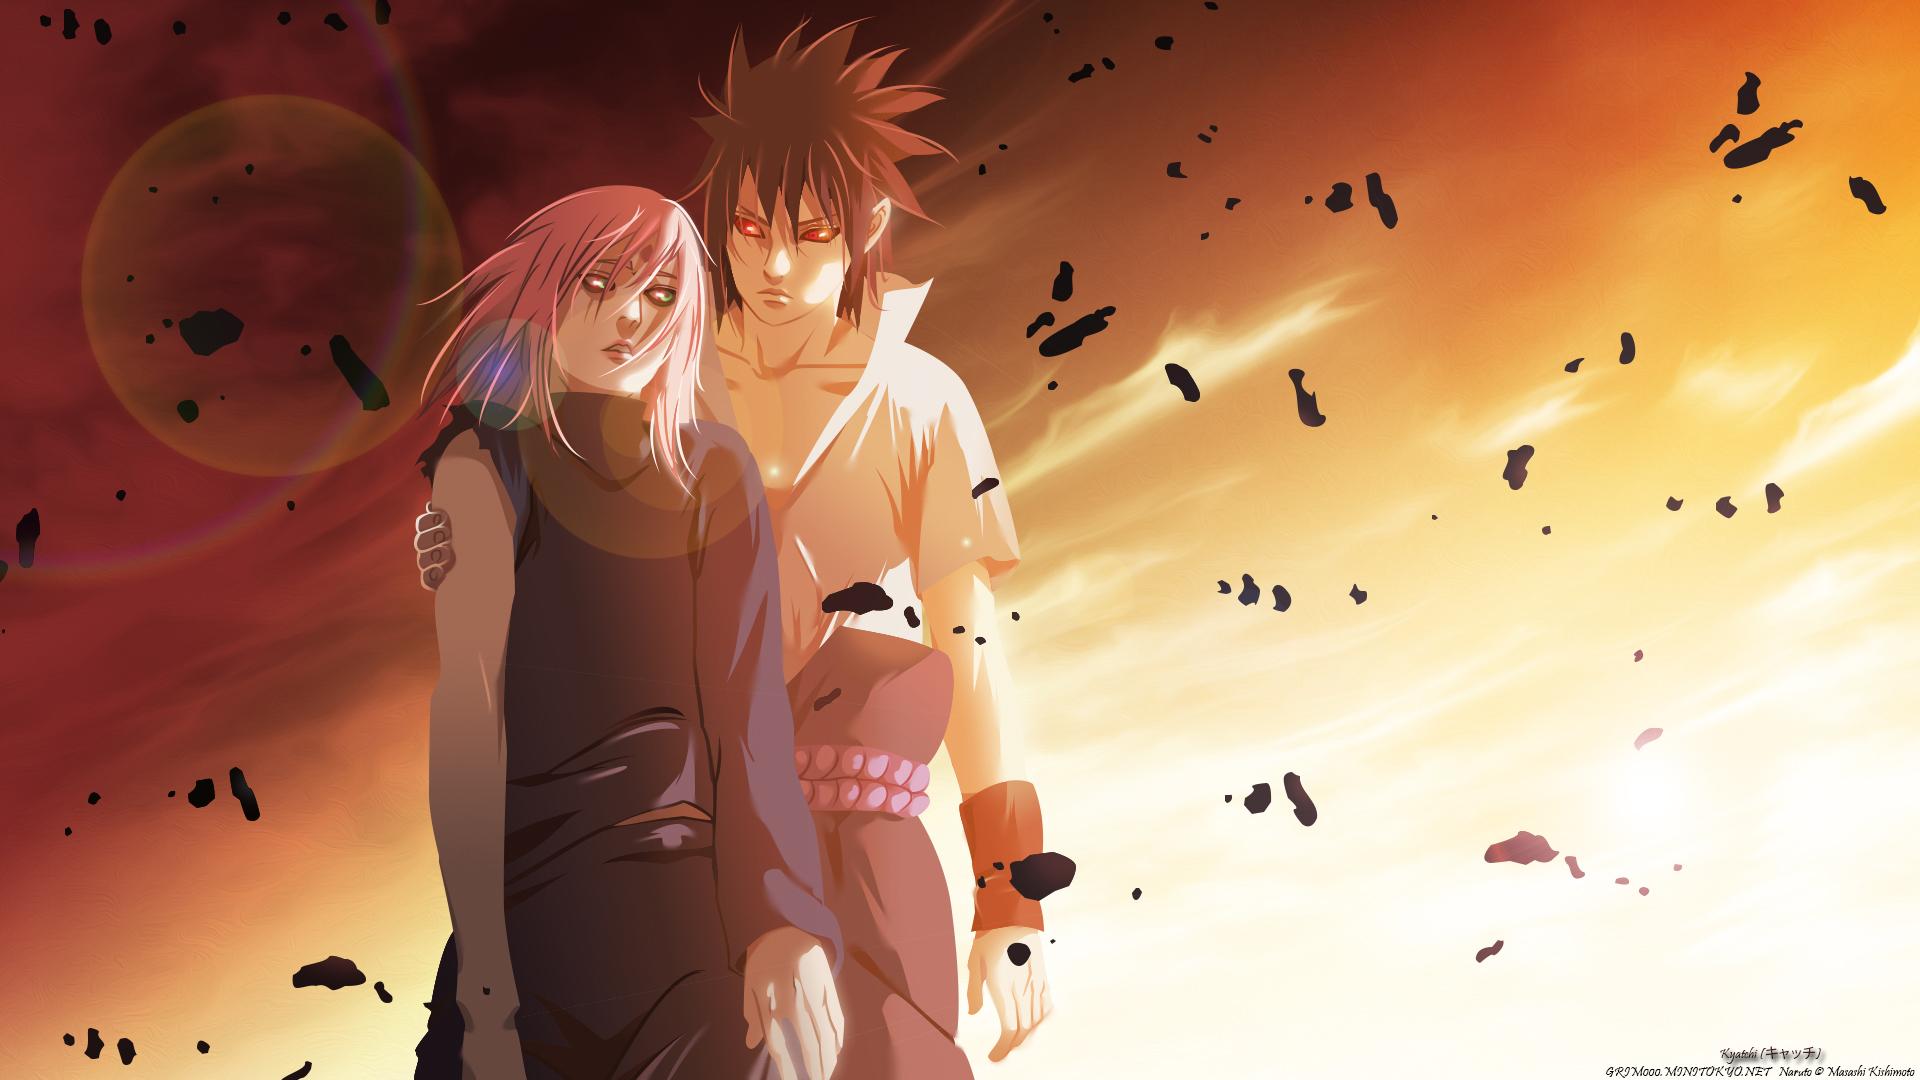 Naruto Hd Wallpaper 1802128 Zerochan Anime Image Board